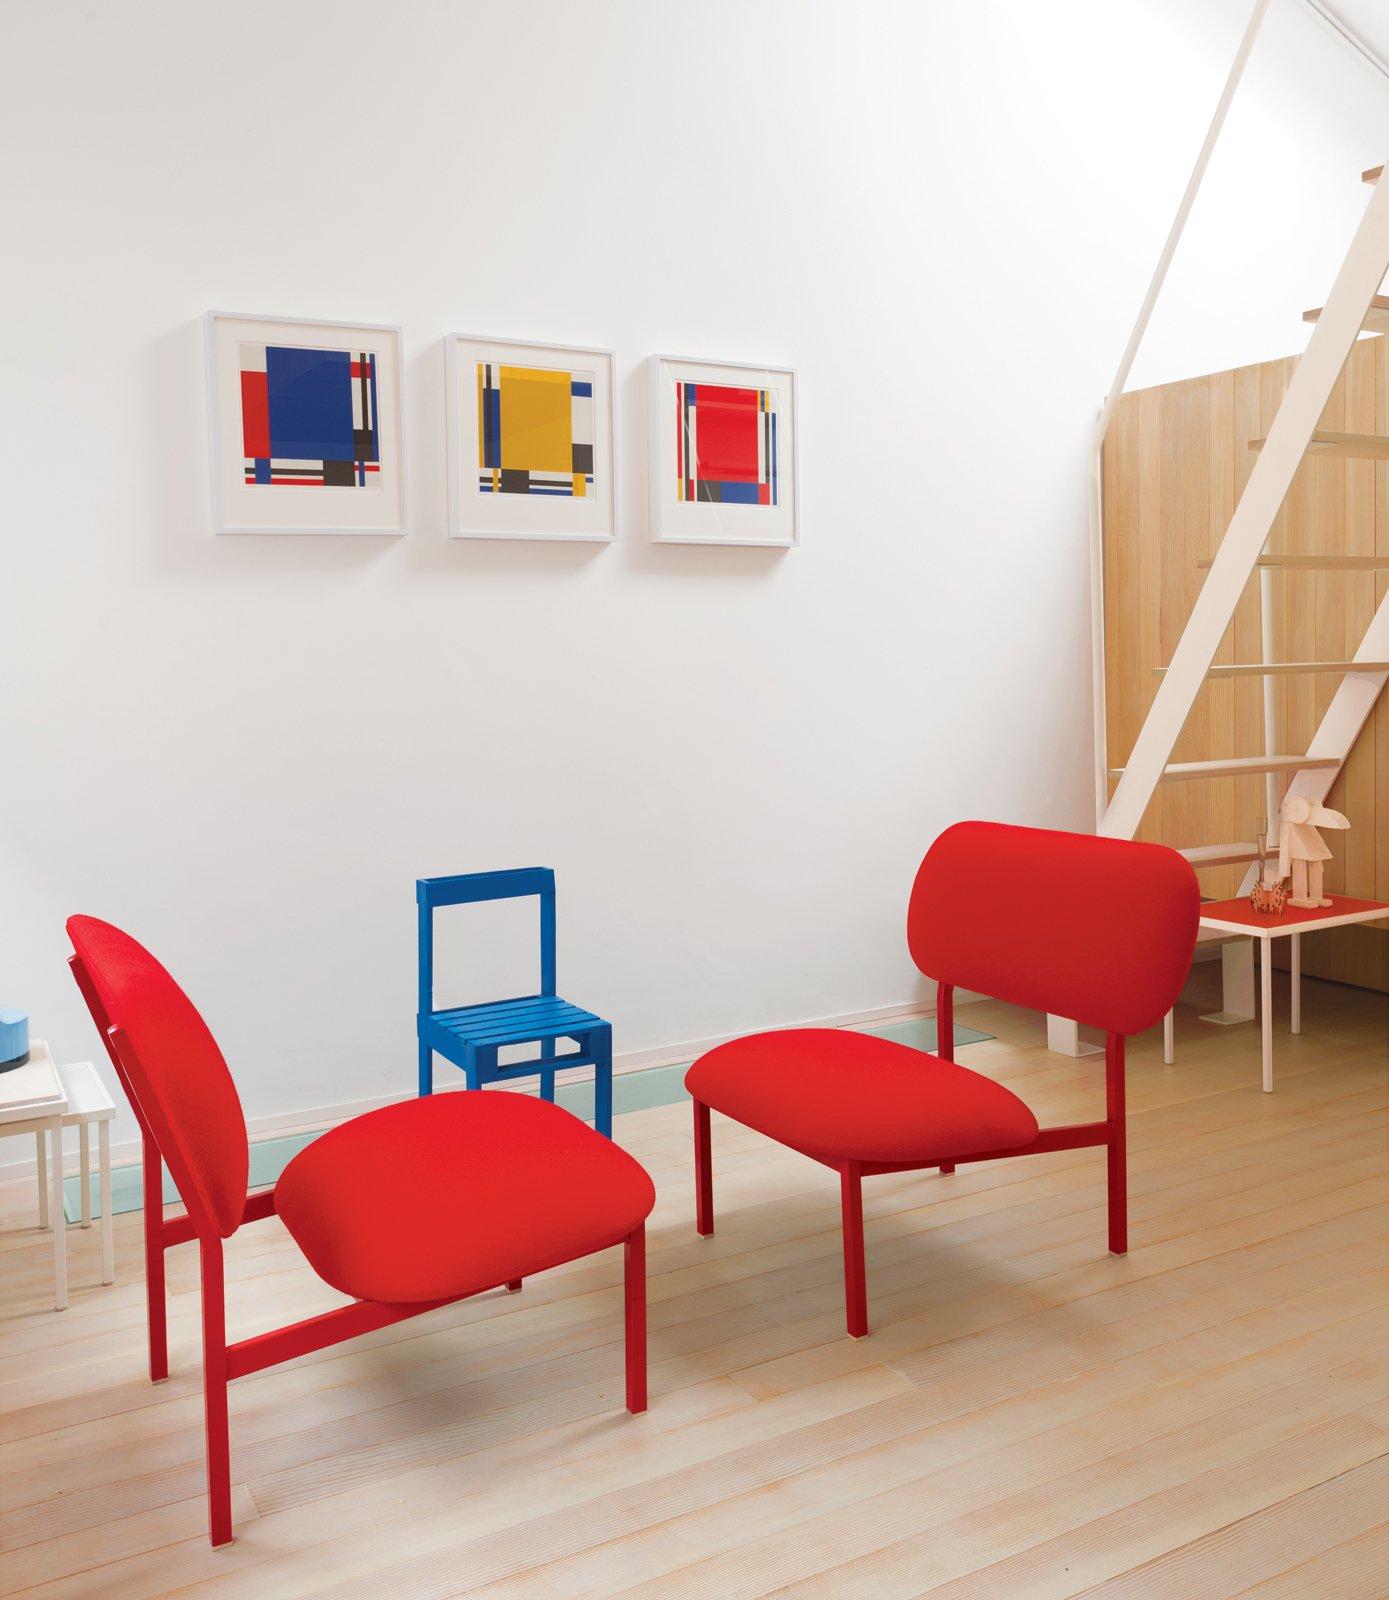 #interior #modern #inside #design #interiordesign #guesthouse #london #custom #colorful #color #wallart #stairs #redchair #castoffs #tolstrup #reimagineseries #palletchair #studiomama #ninatolstrup #jackmama #bethhnalgreen #seatingdesign #seating